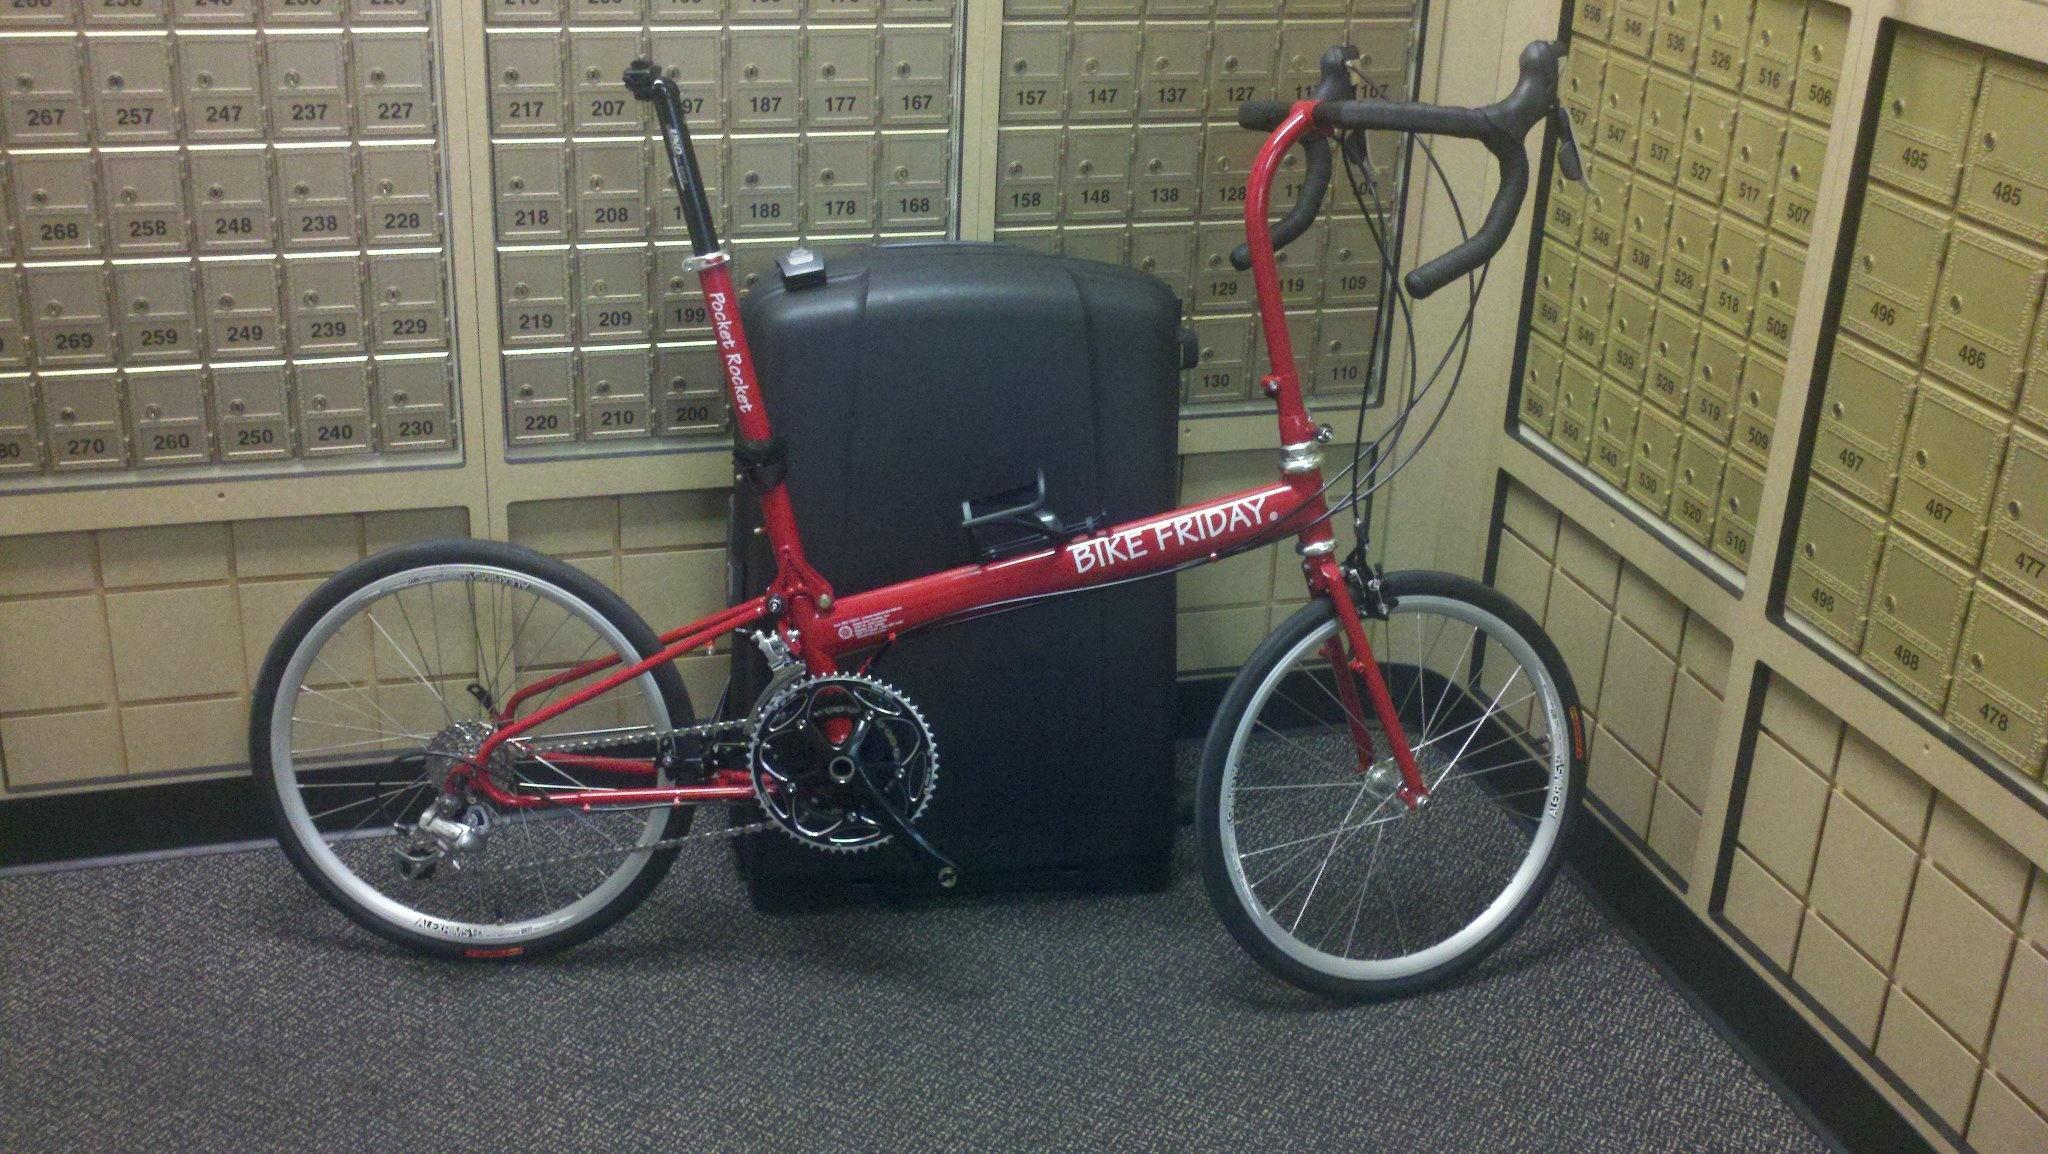 Bike Friday Bike Friday Pocket Rocket, Red, trailer, travel system